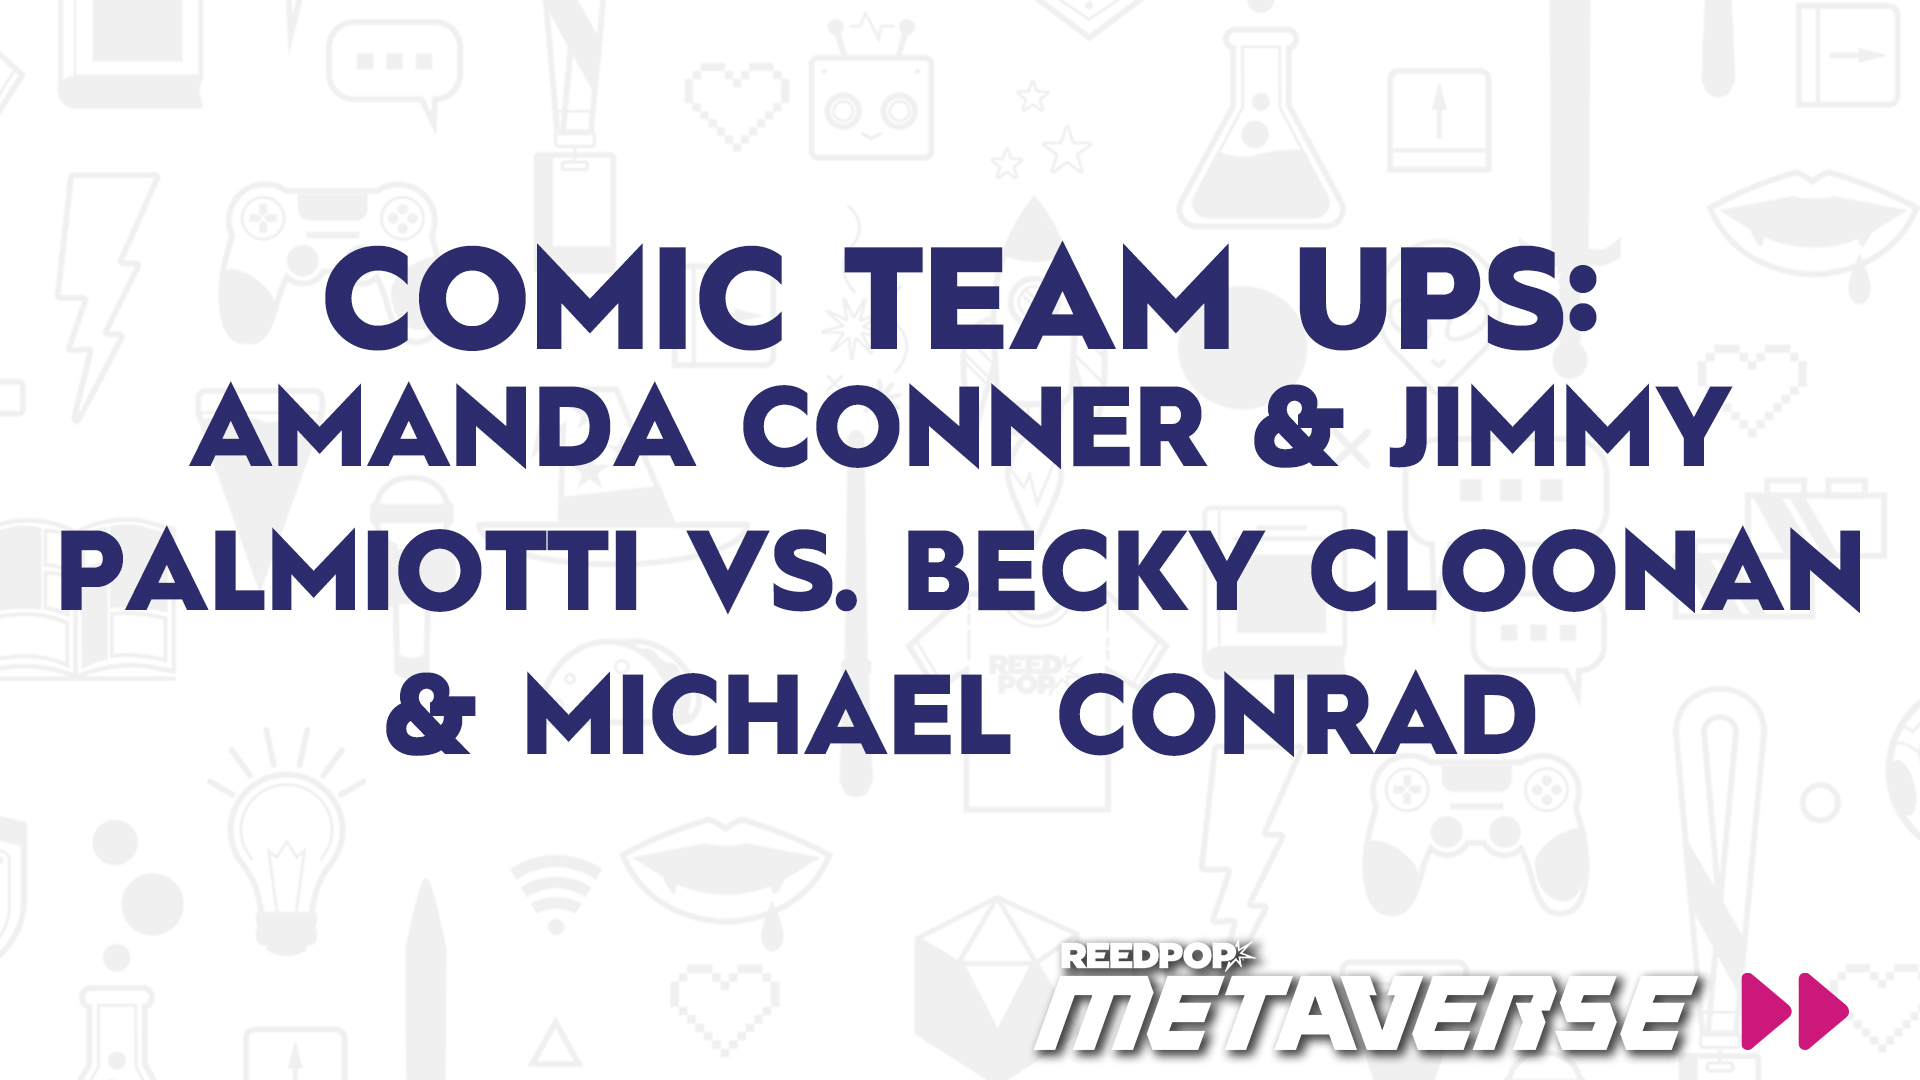 Image for Comic Team Ups: Amanda Conner & Jimmy Palmiotti vs. Becky Cloonan & Michael Conrad